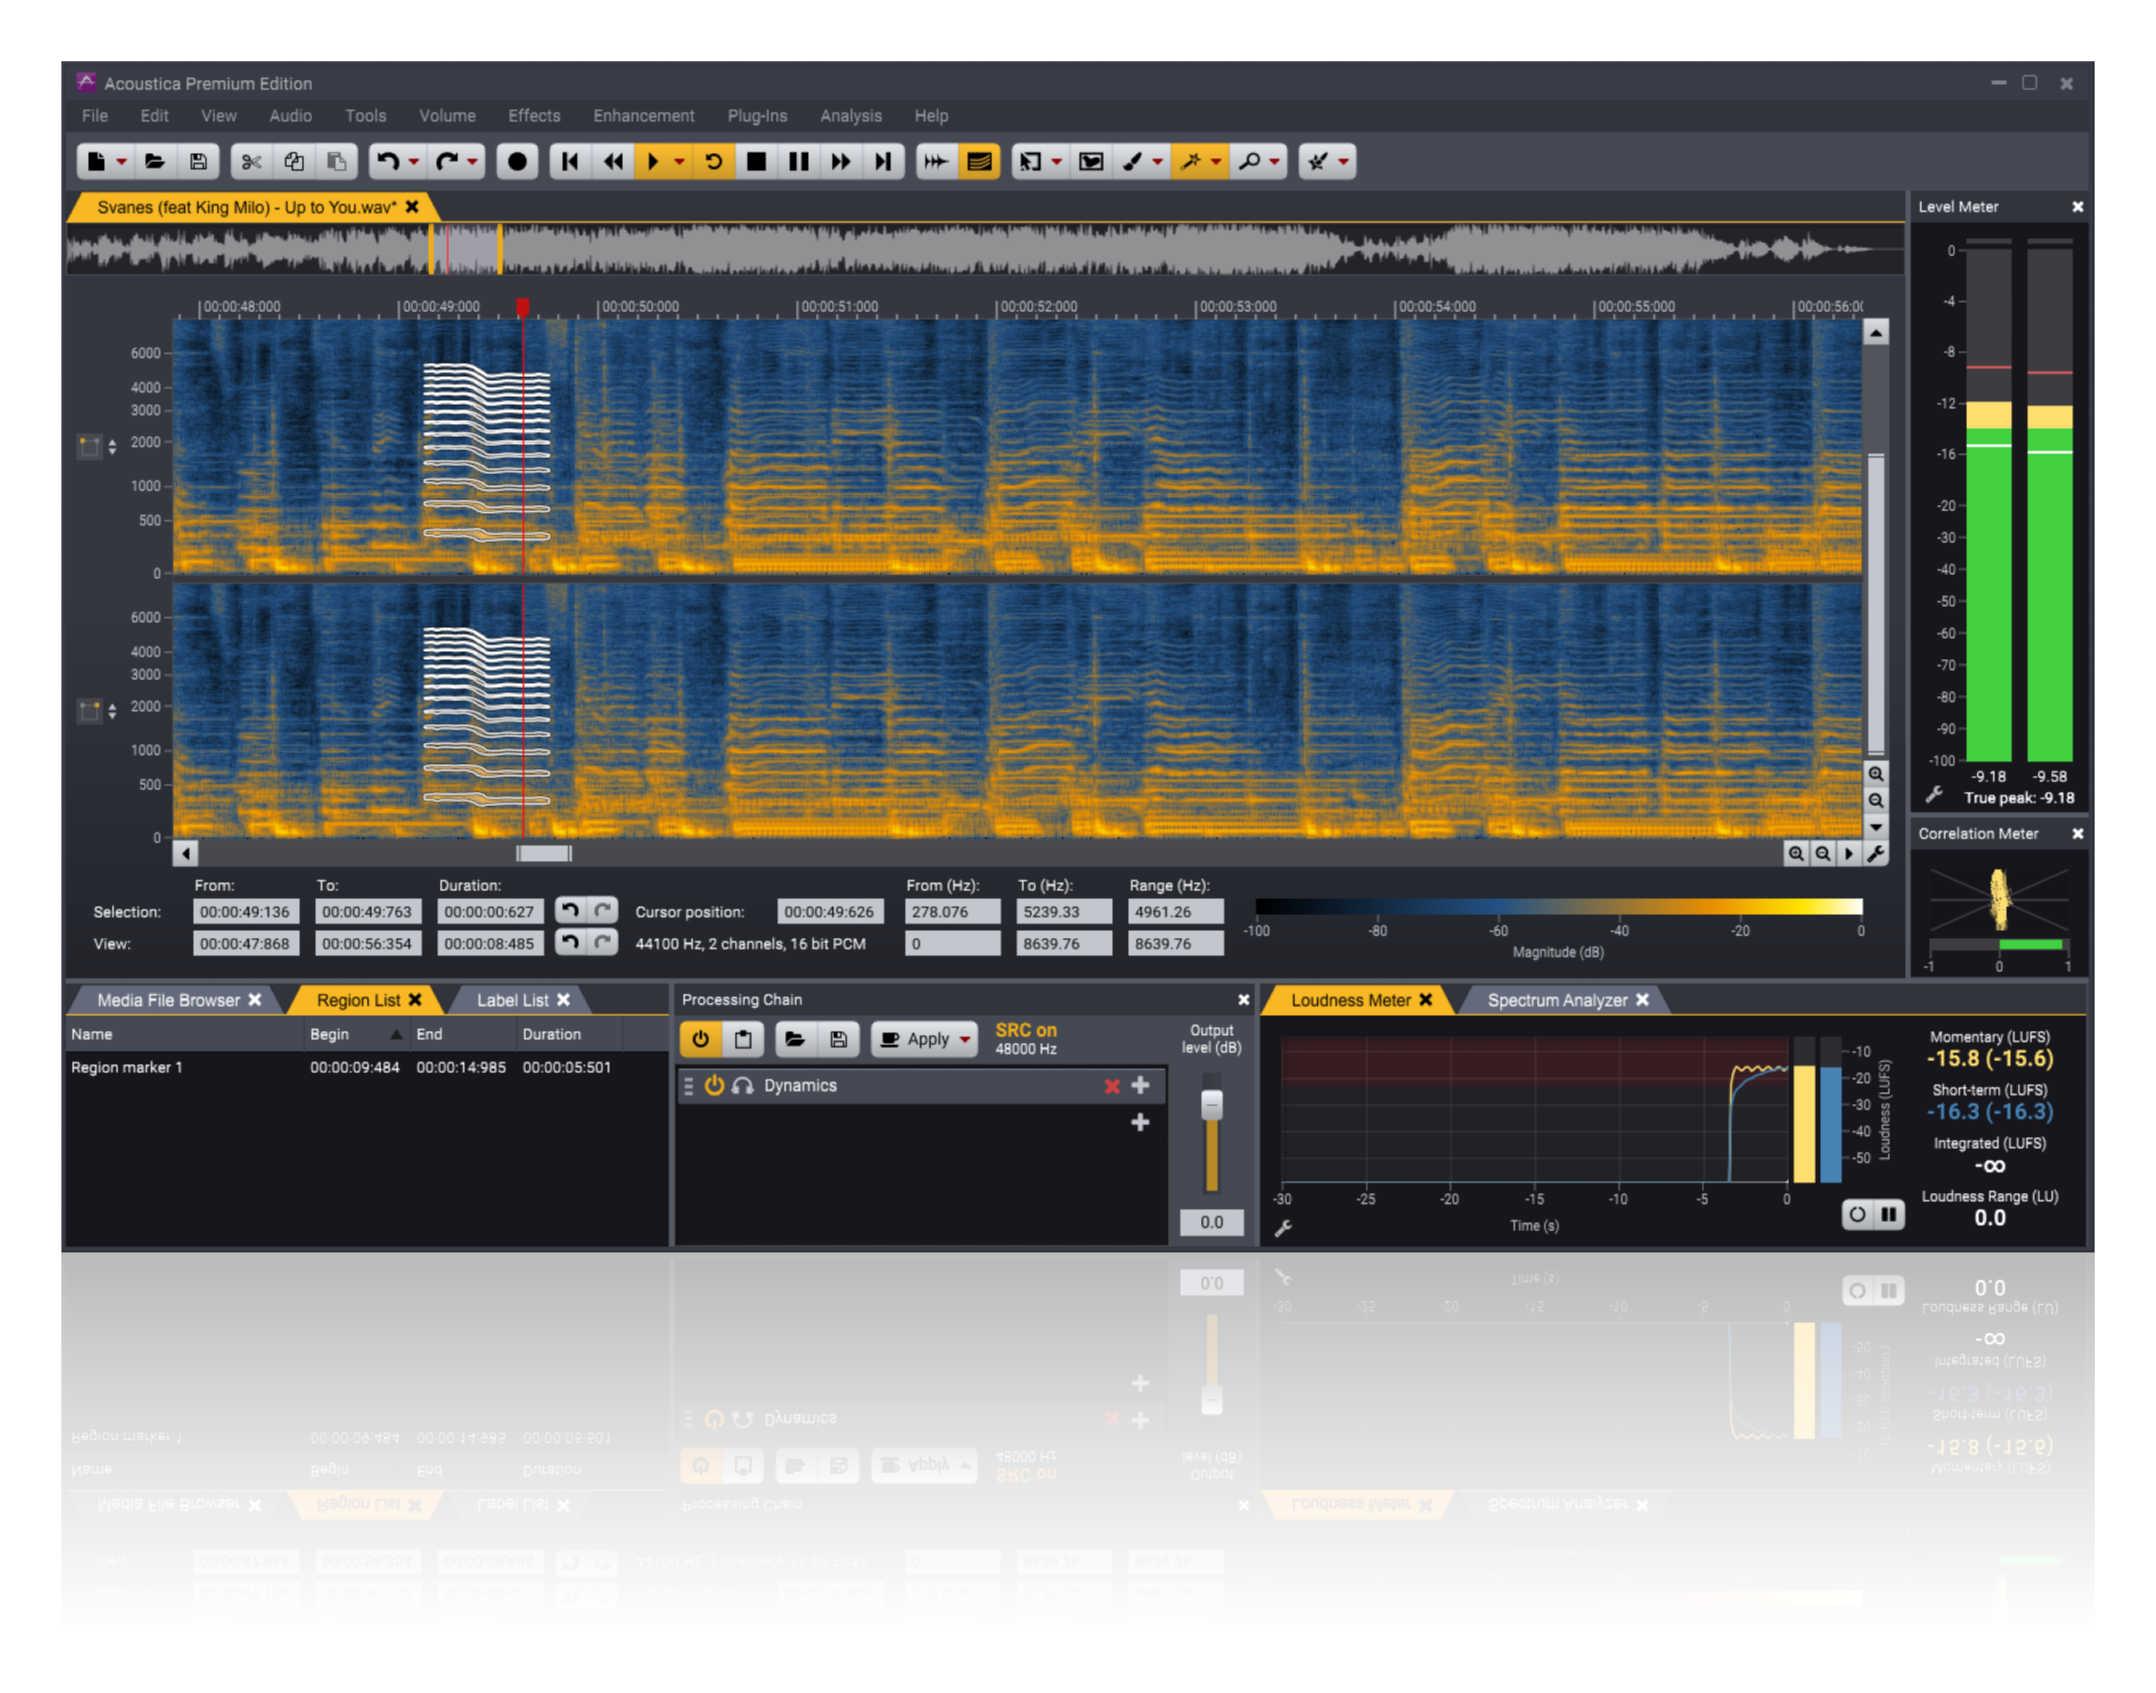 Acoustica-Premium-Edition-7-DMG-Setup